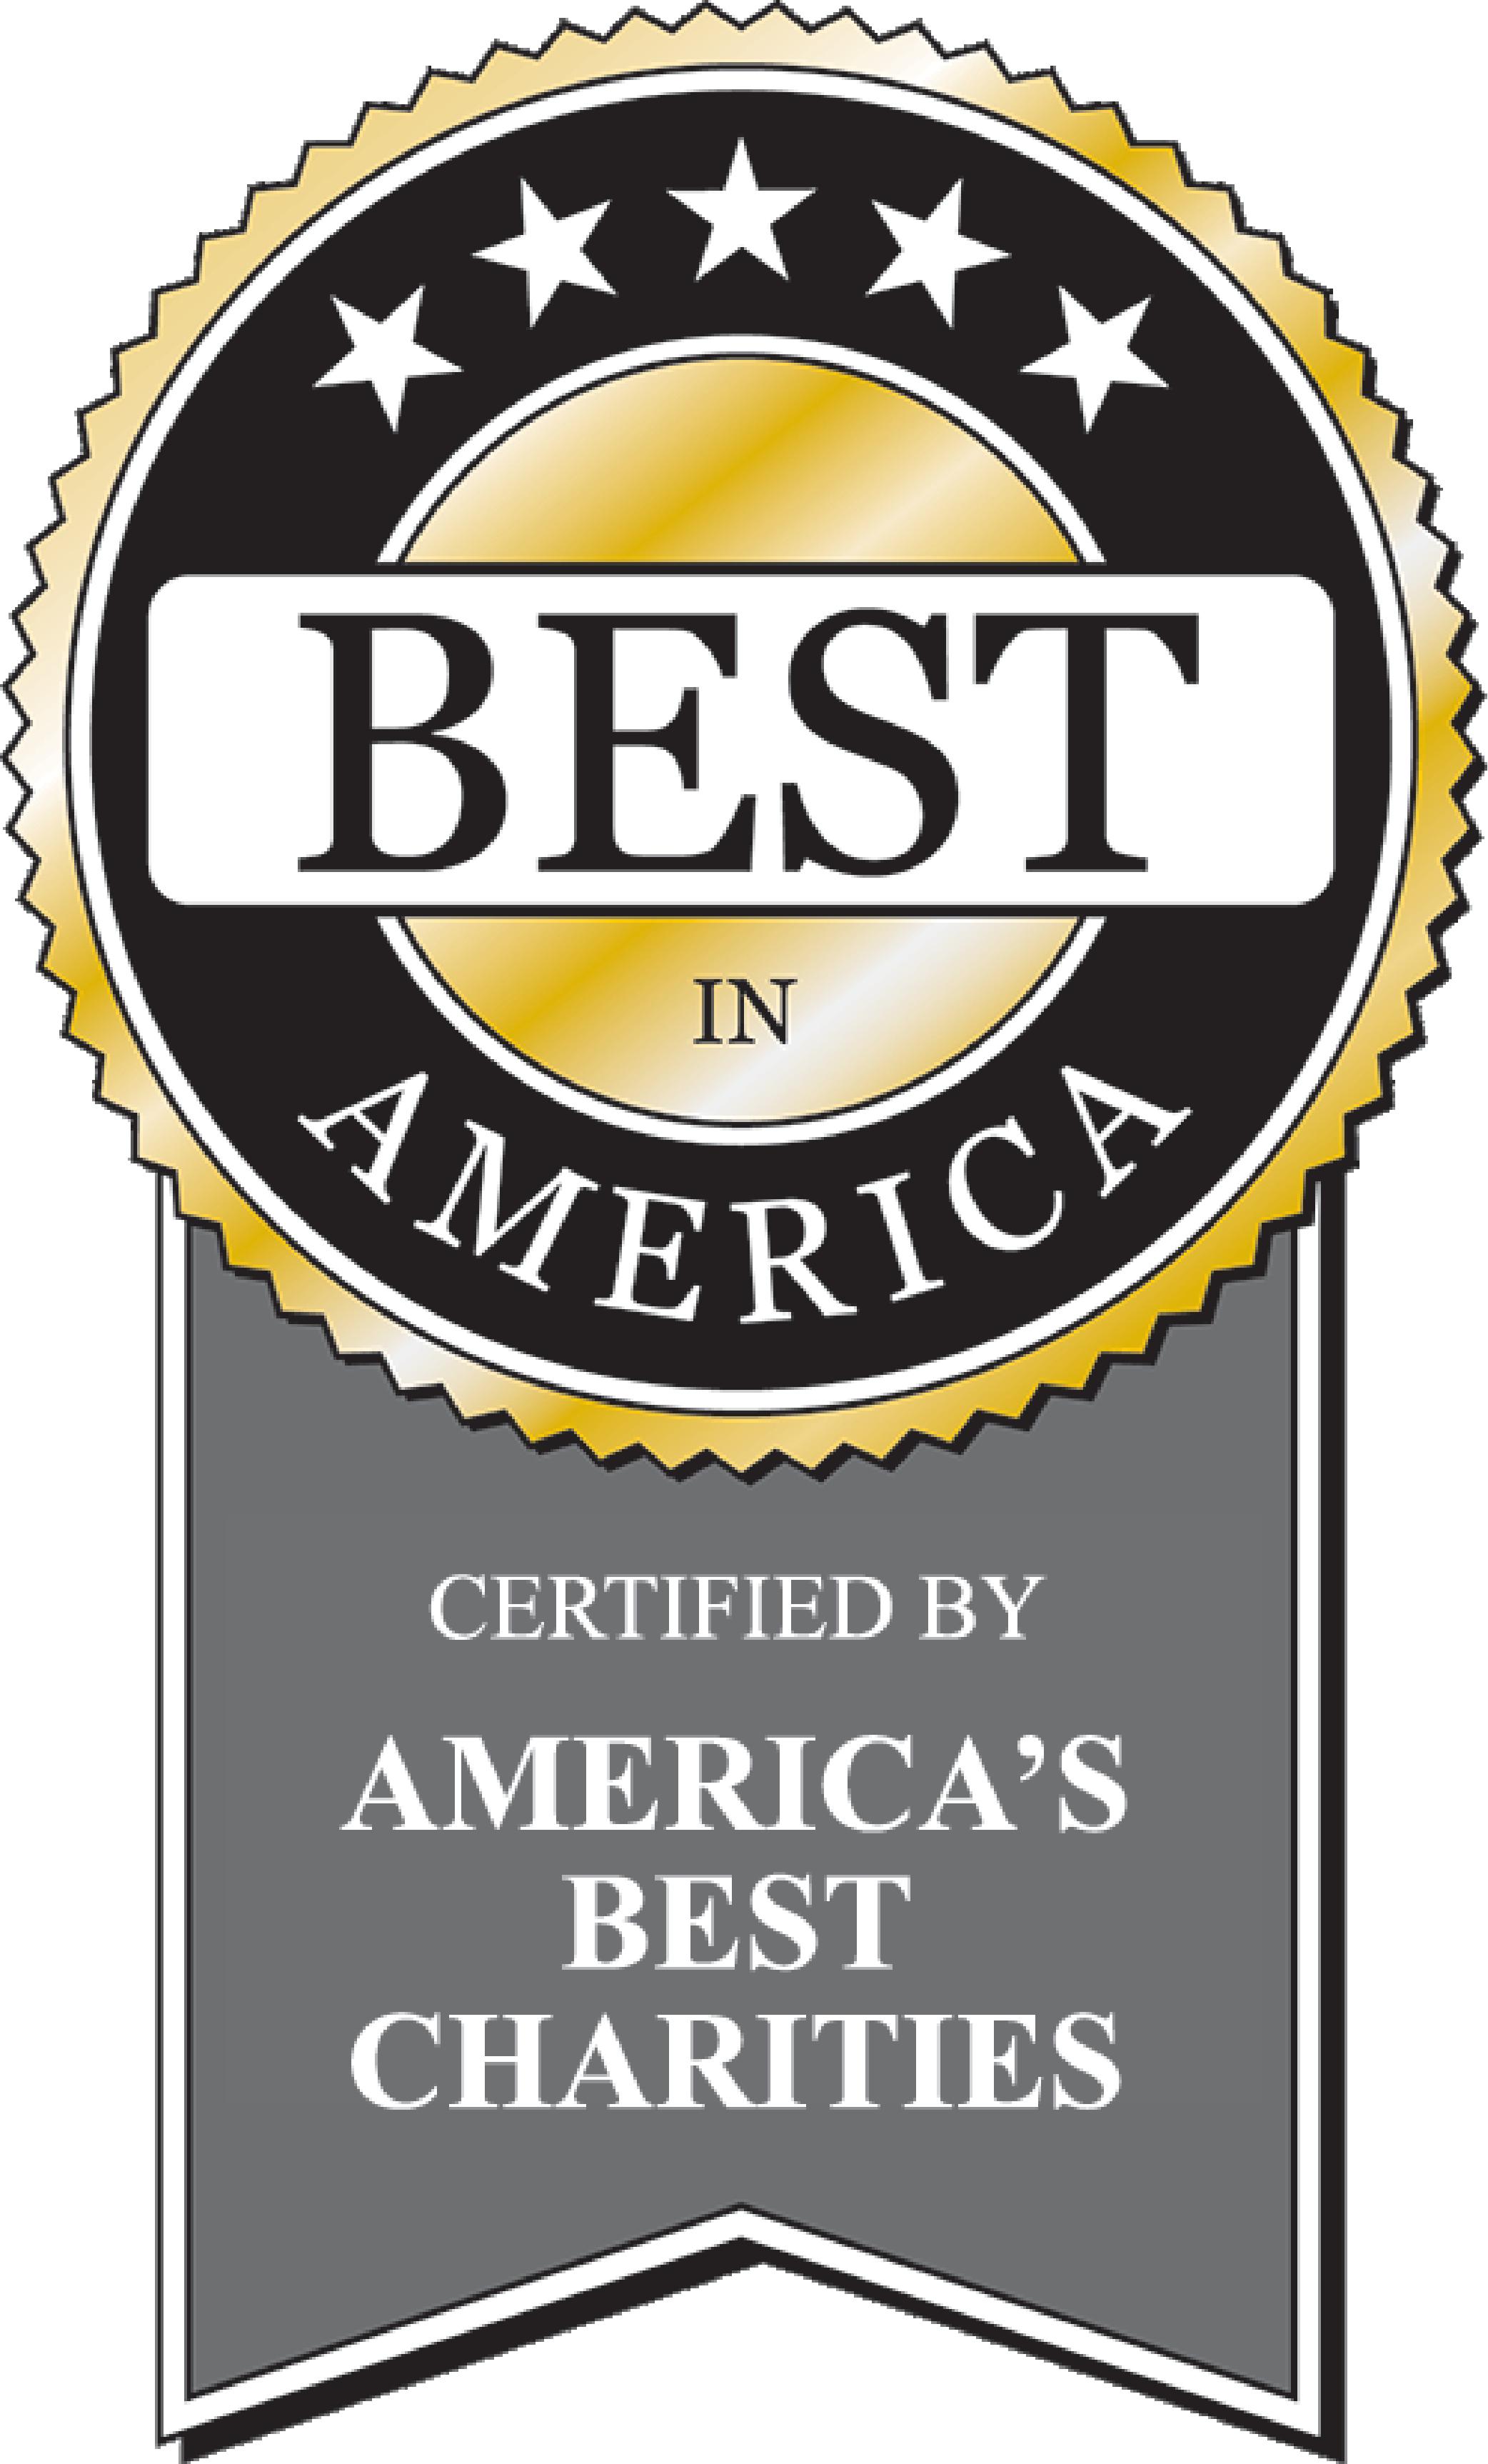 Best in America Certified by America's Best Charities gold ribbon